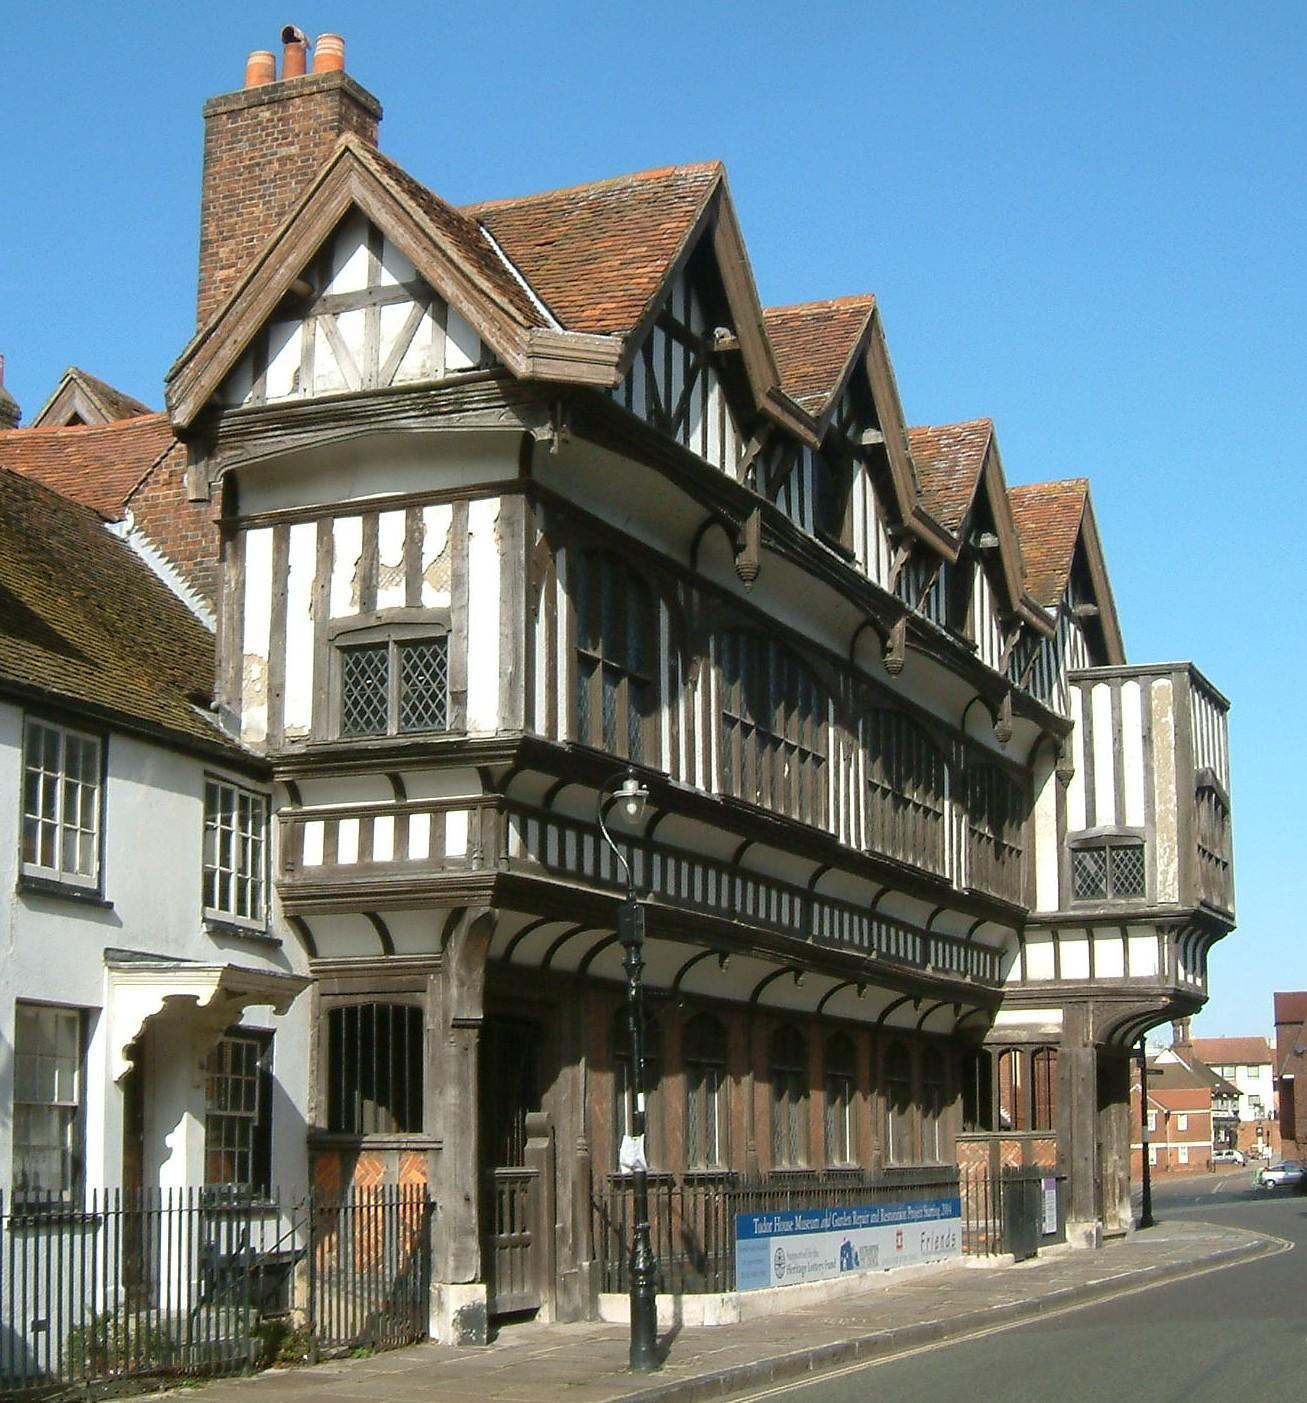 File:Southampton - Maison Tudor 02.JPG - Wikimedia Commons